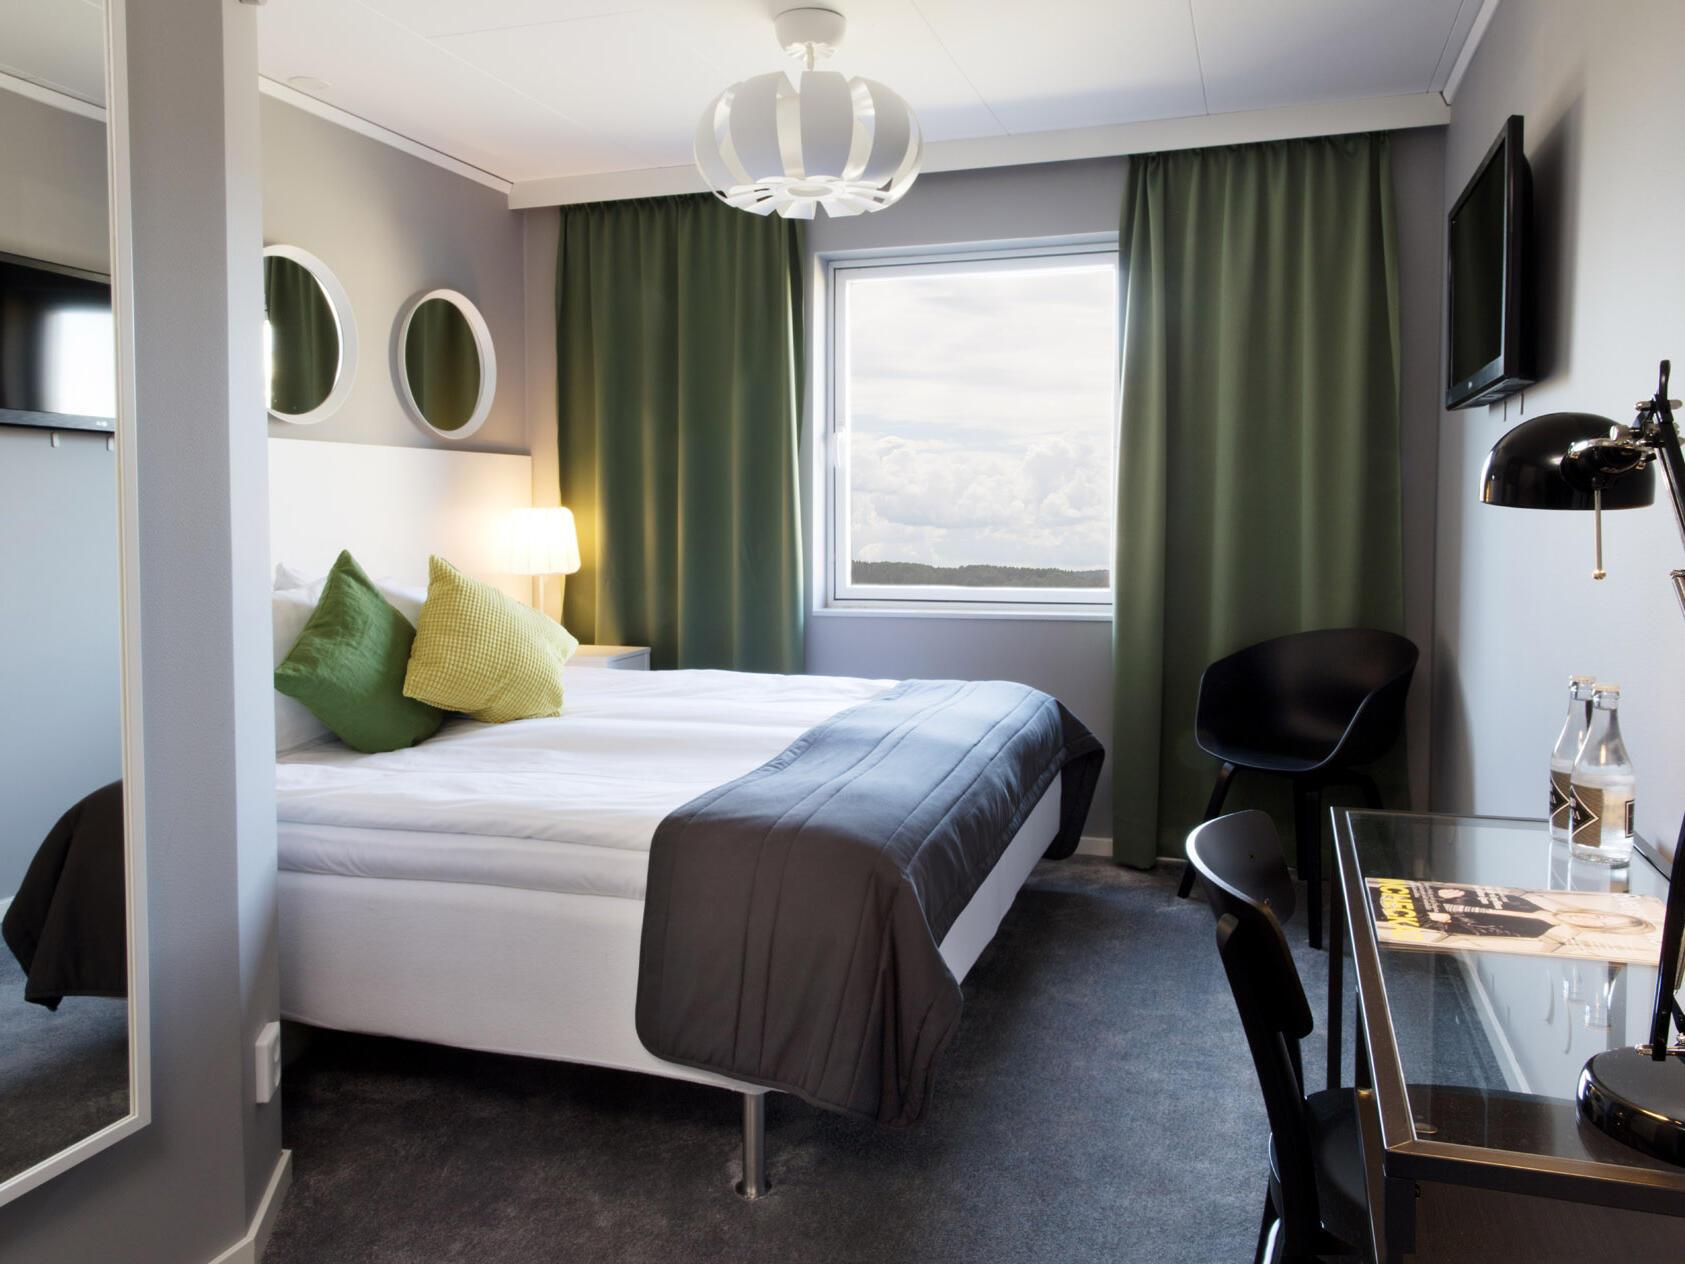 Superior King Room at Welcome Hotel in Järfälla, Sweden